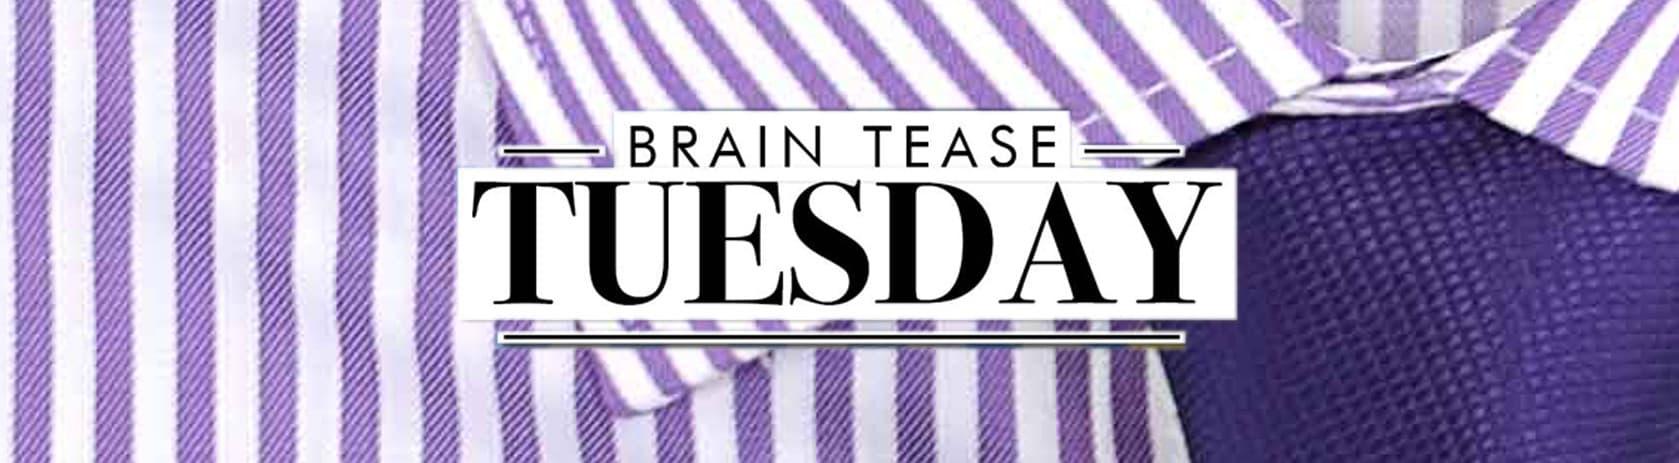 Brain Tease Tuesday Week 23